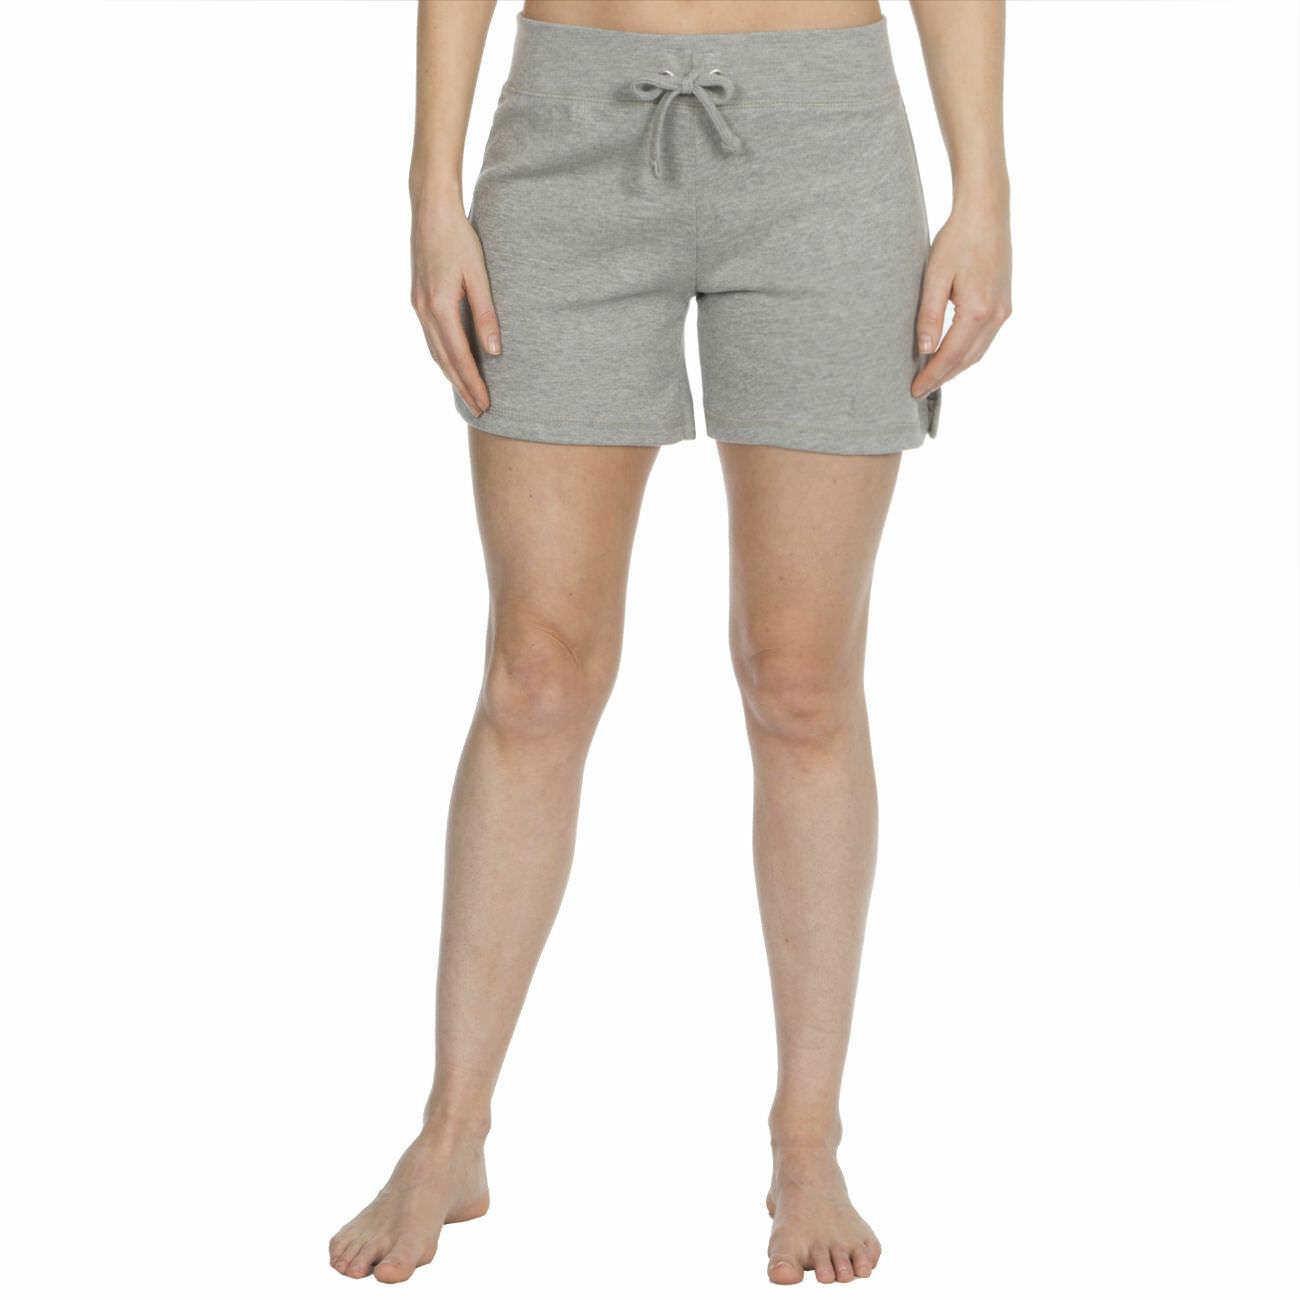 Womens-Cotton-Jersey-Shorts-Elastic-Waist-Summer-Beach-Casual-Yoga-Hot-Pants-New thumbnail 7